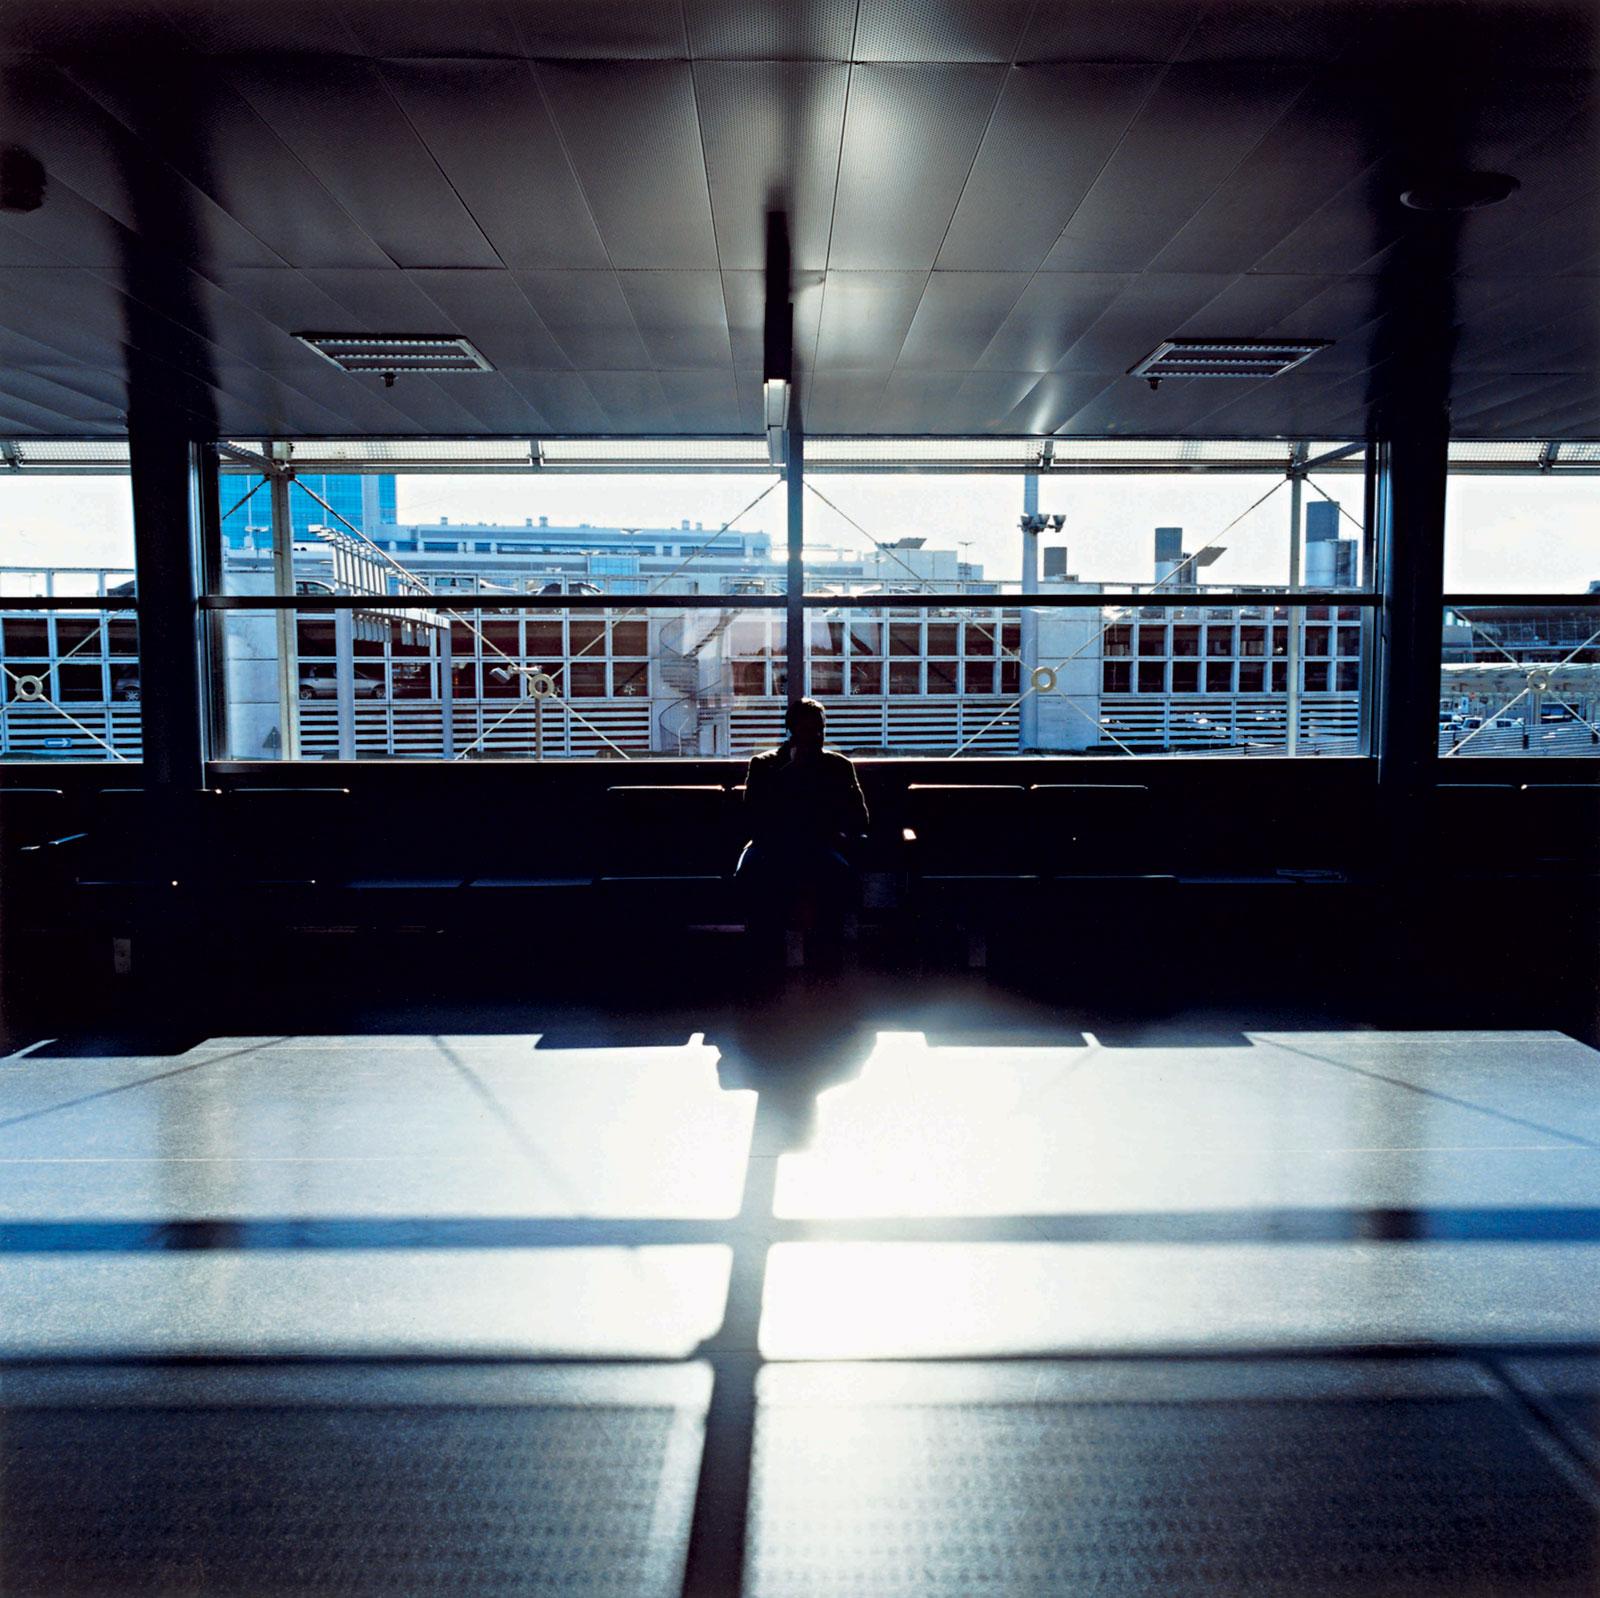 Helsinki Airport 14:07, 2008, C-print, 120 x 120 cm